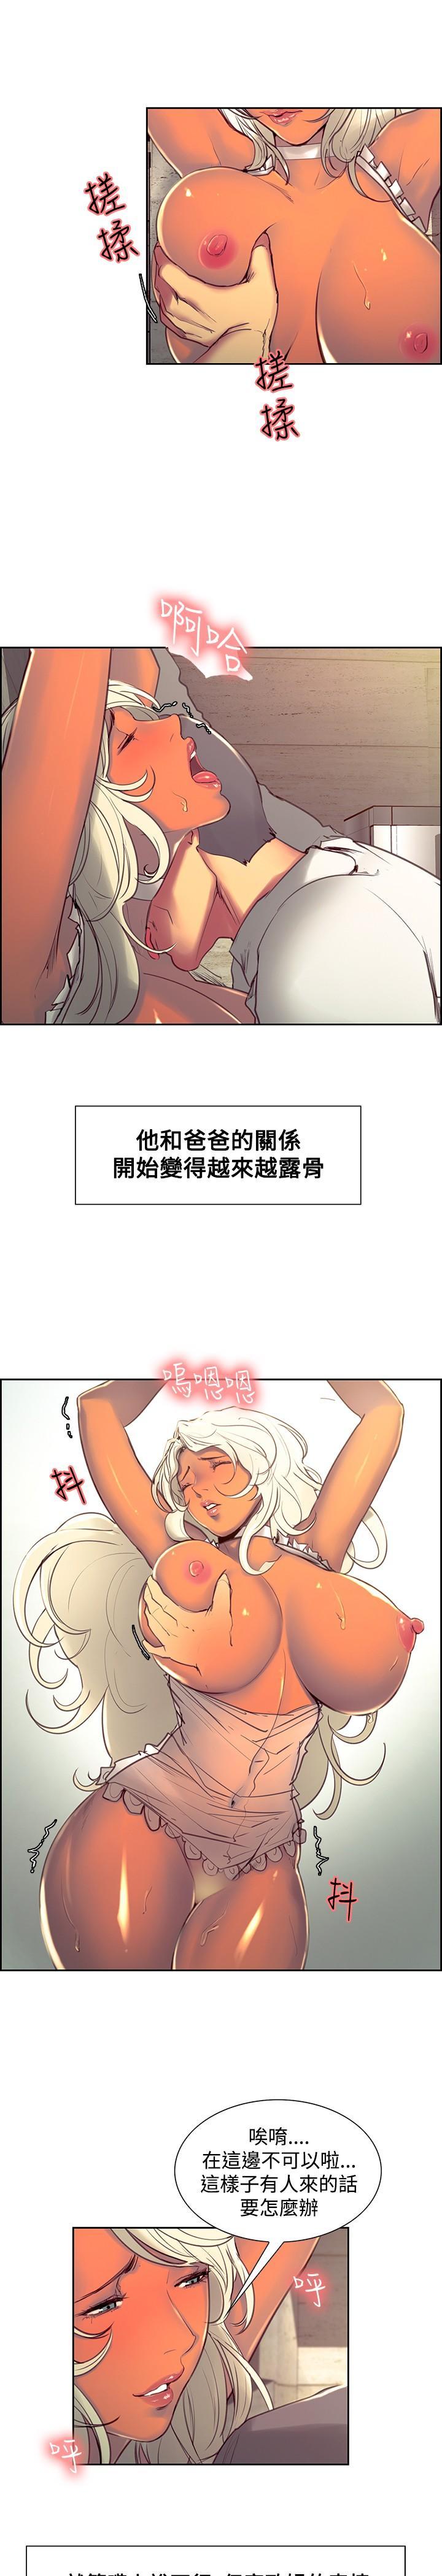 Domesticate the Housekeeper 调教家政妇 ch.29-32 38